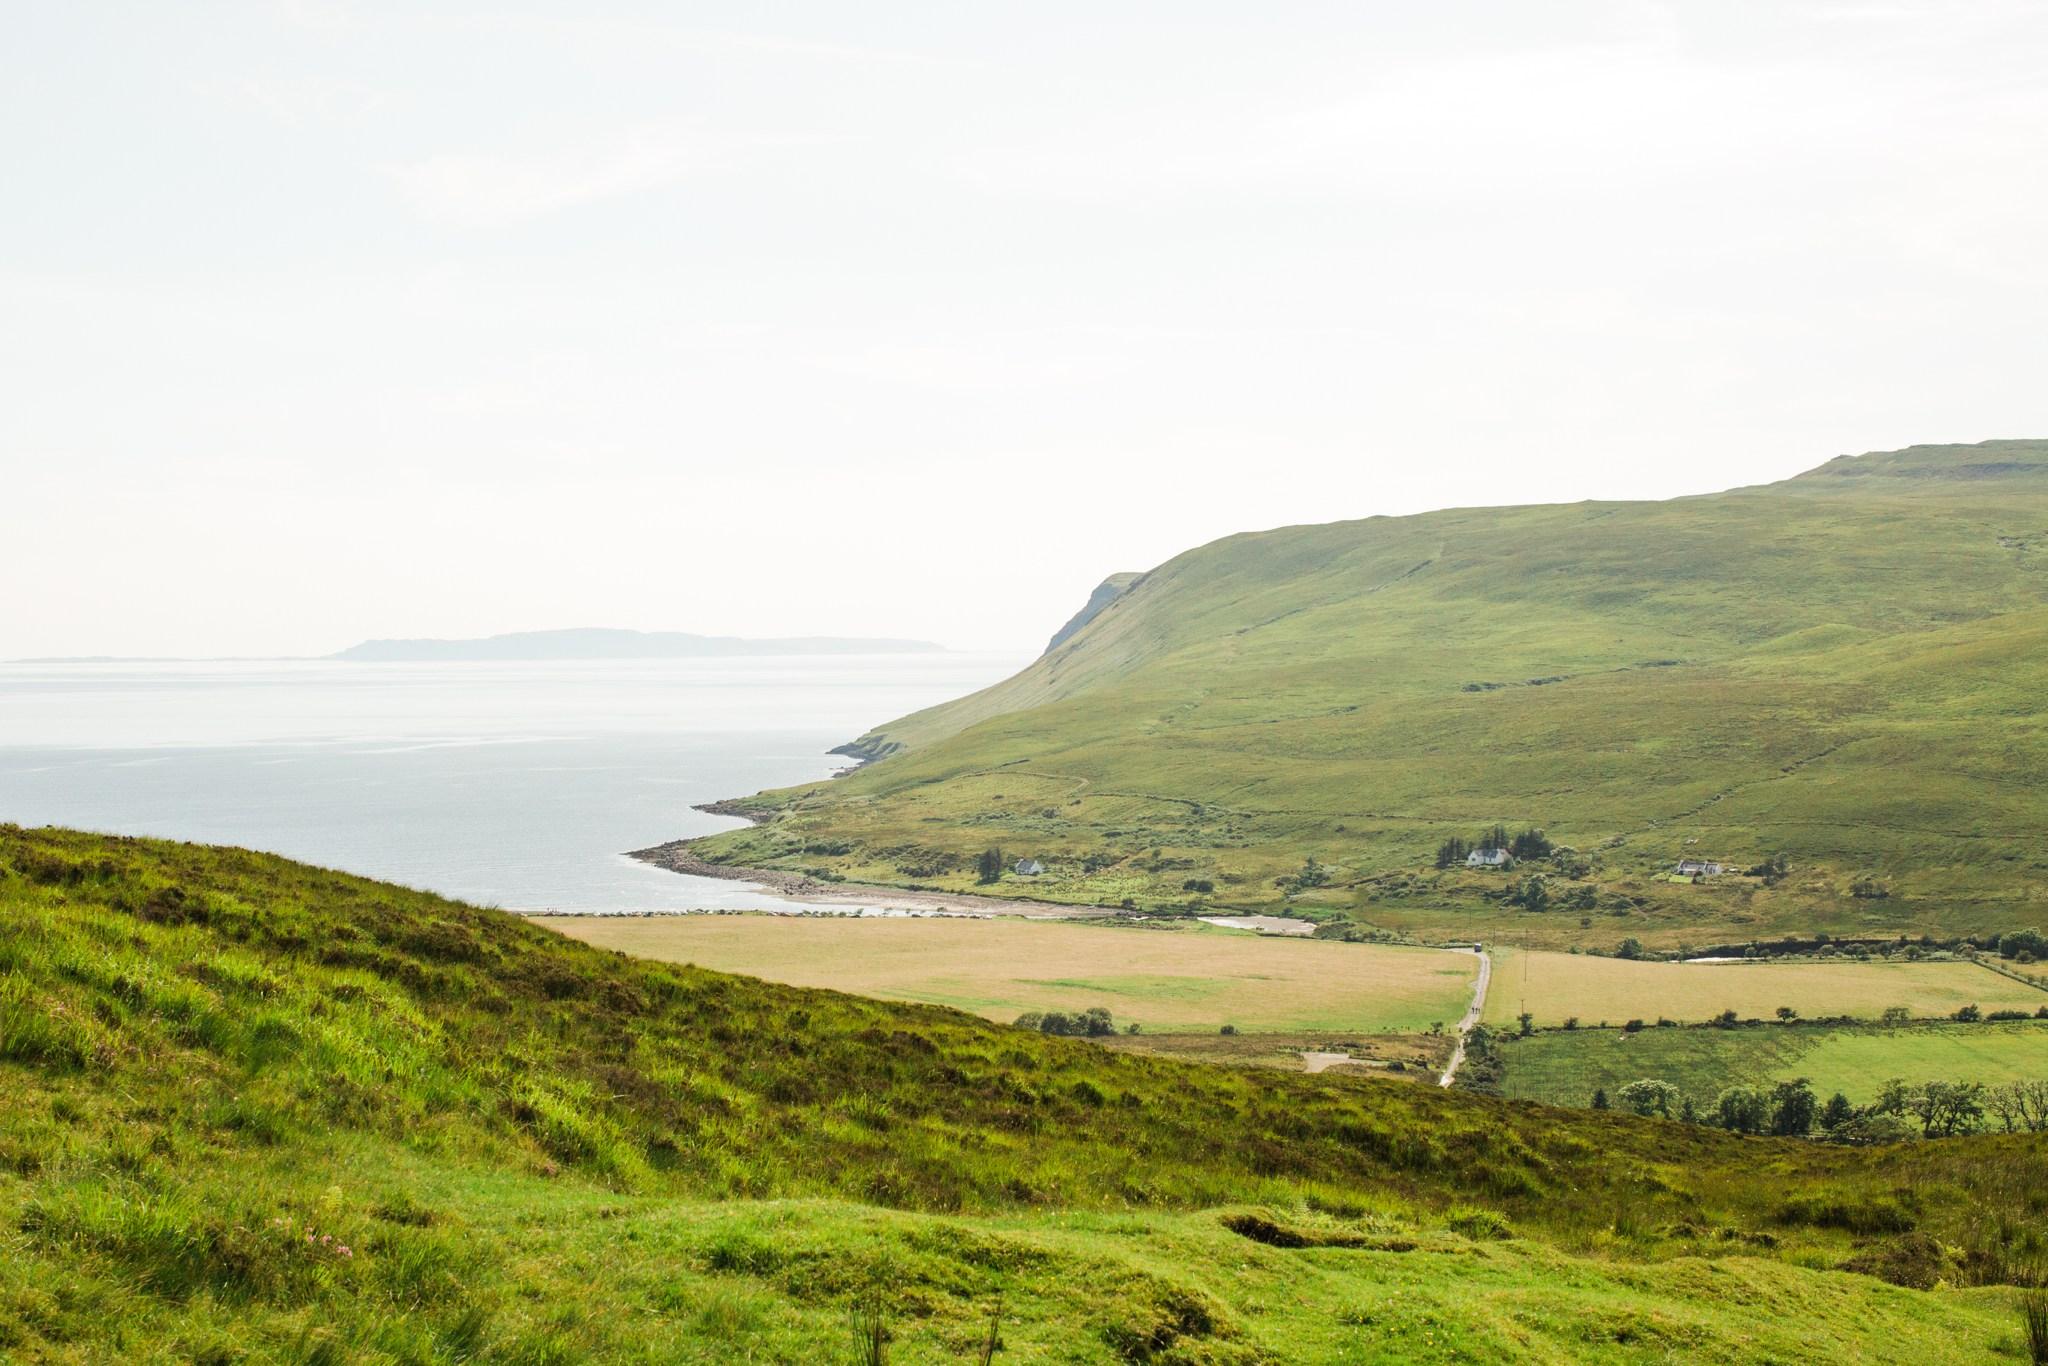 scotland_landscapes_deborah_zoe_photography_00003.JPG